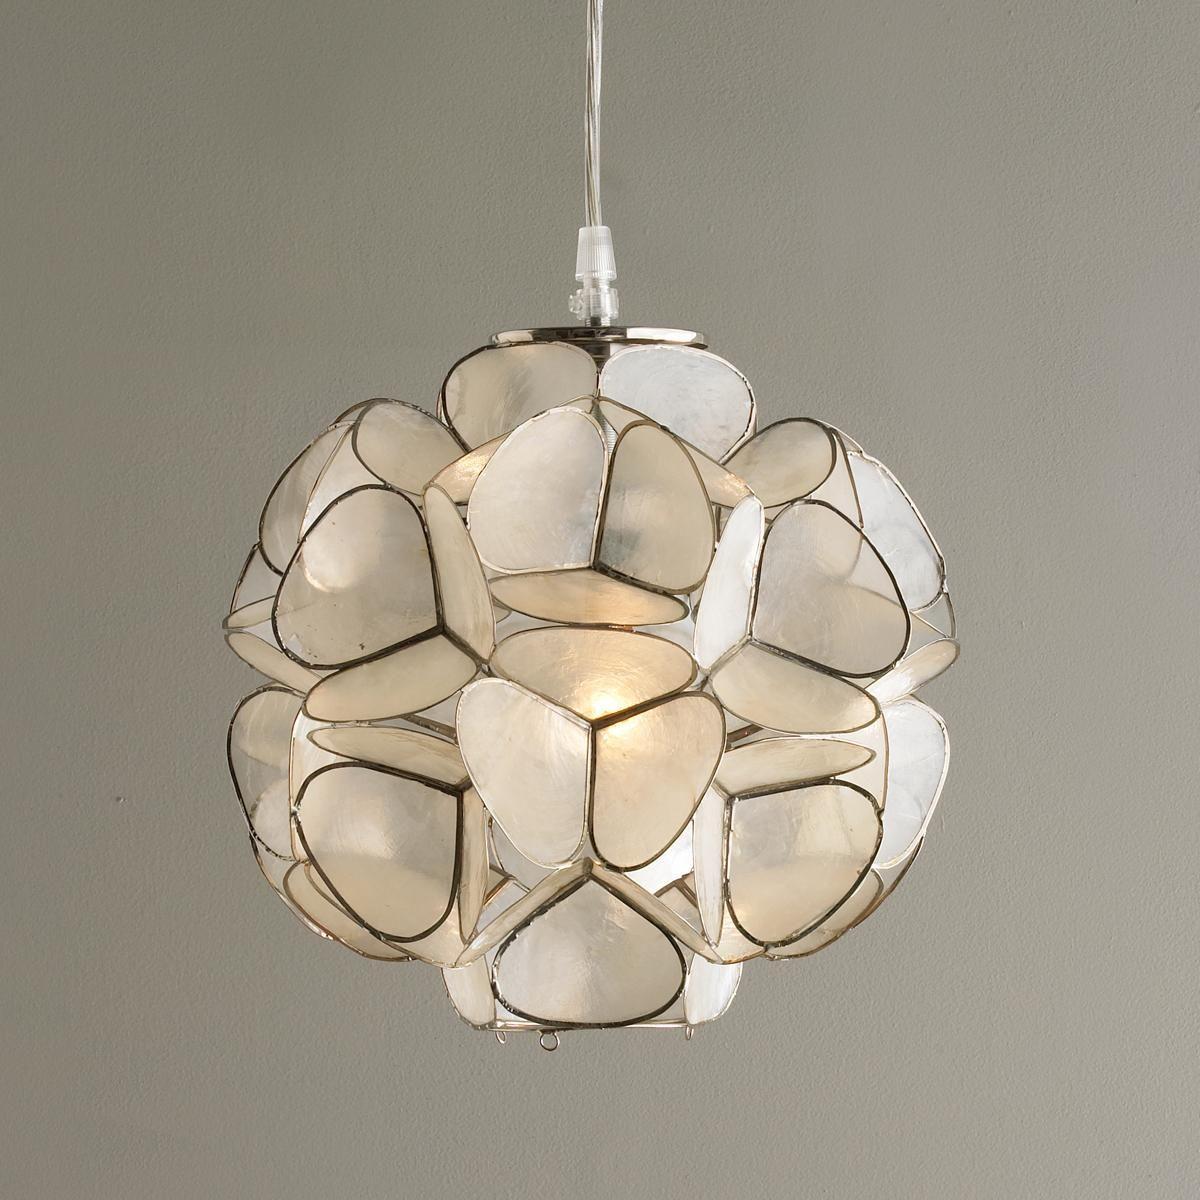 Capiz Shell Flower Pendant Light Use As Ceiling Light Pendant Light Contemporary Pendant Lights Pendant Light Shades